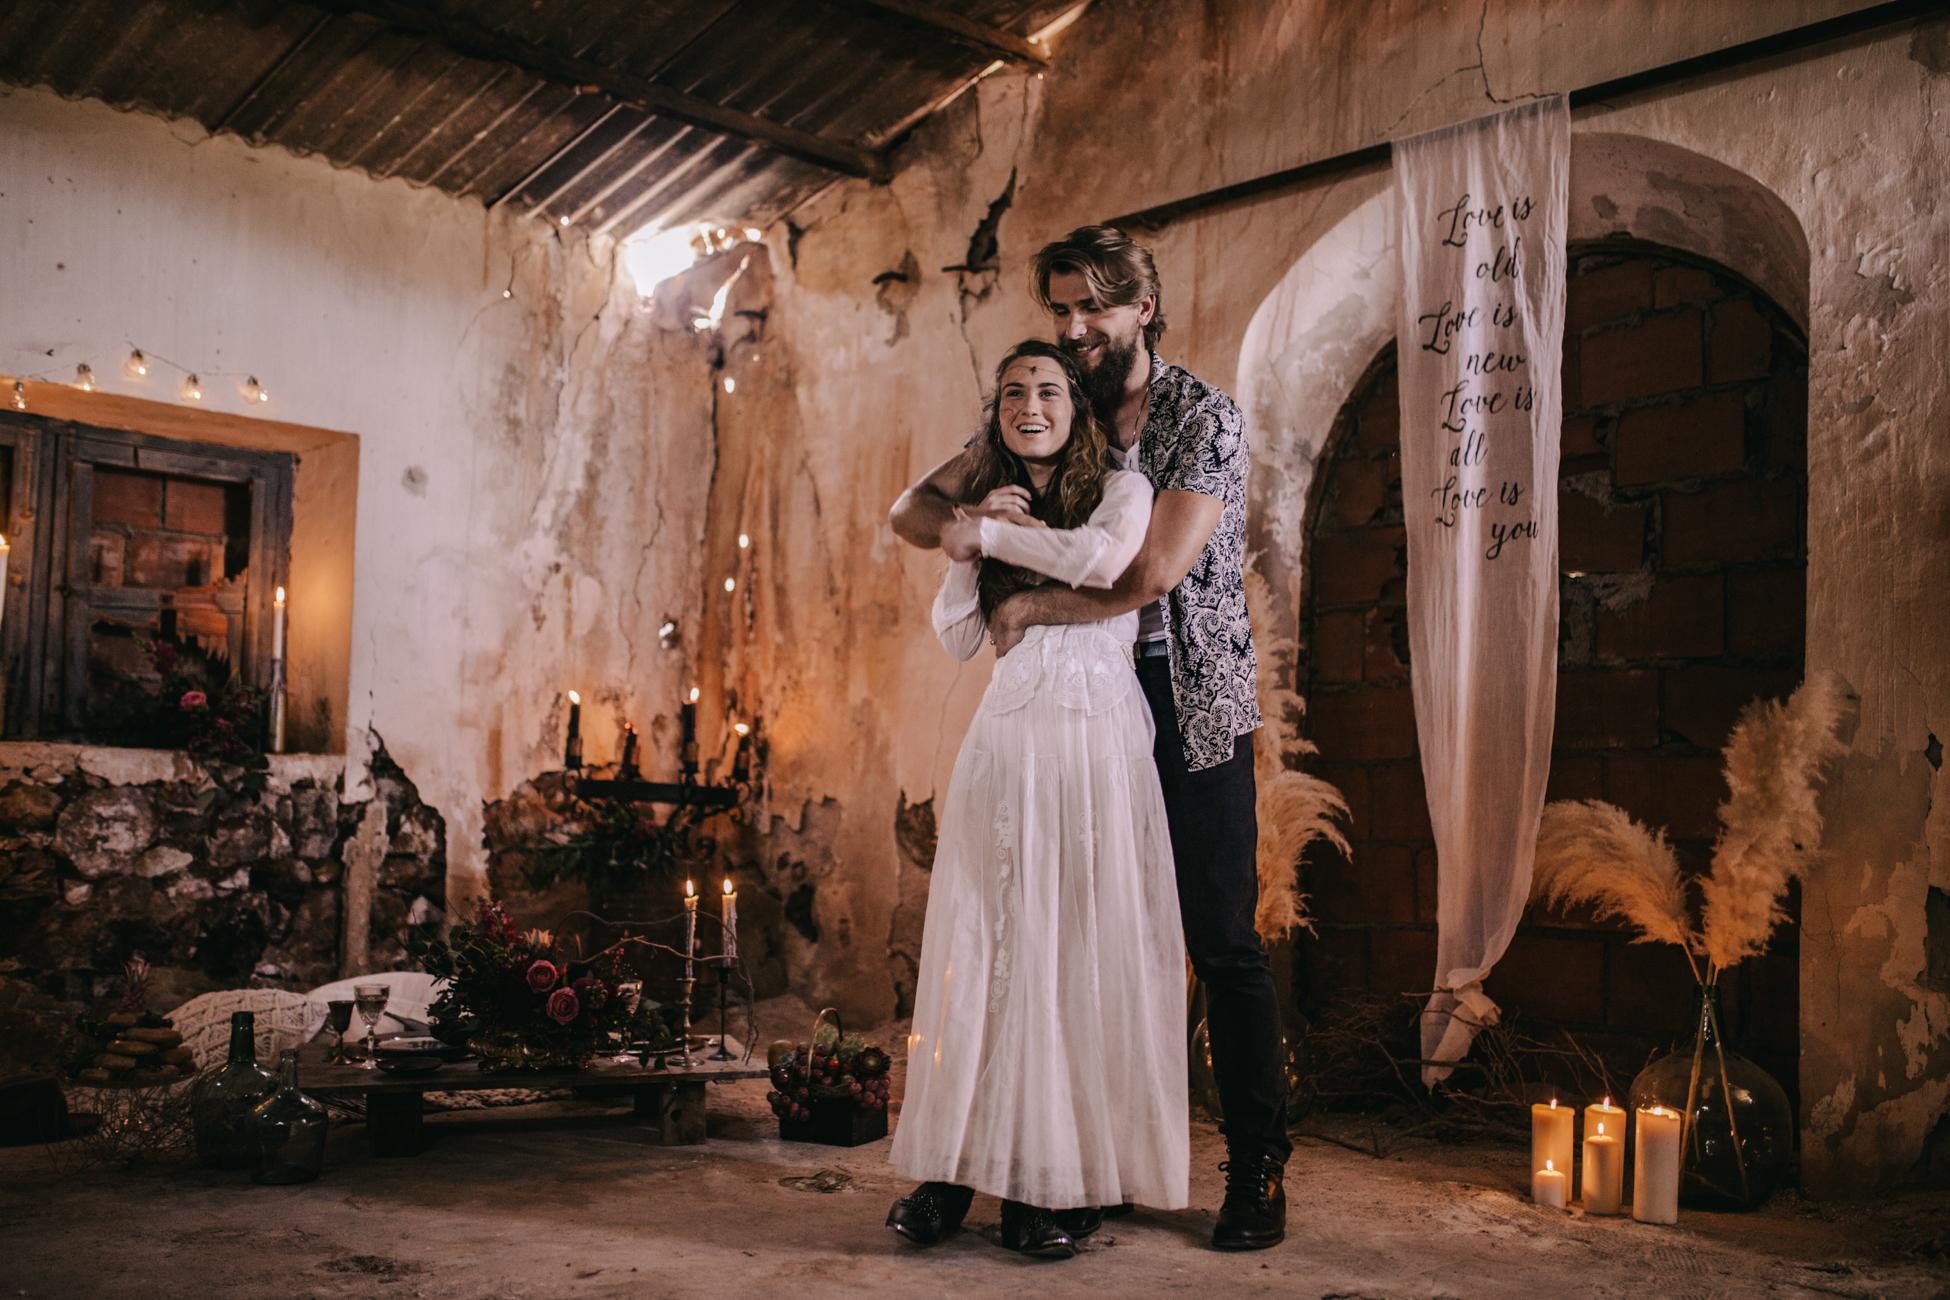 thenortherngirlphotography_photography_thenortherngirl_rebeccascabros_wedding_weddingphotography_weddingphotographer_wood_muebles_deco_bodasdecaramelo_home_bedtime_gaywedding_editorial_desierto_desert_wildestdreams_amortexano-93.jpg